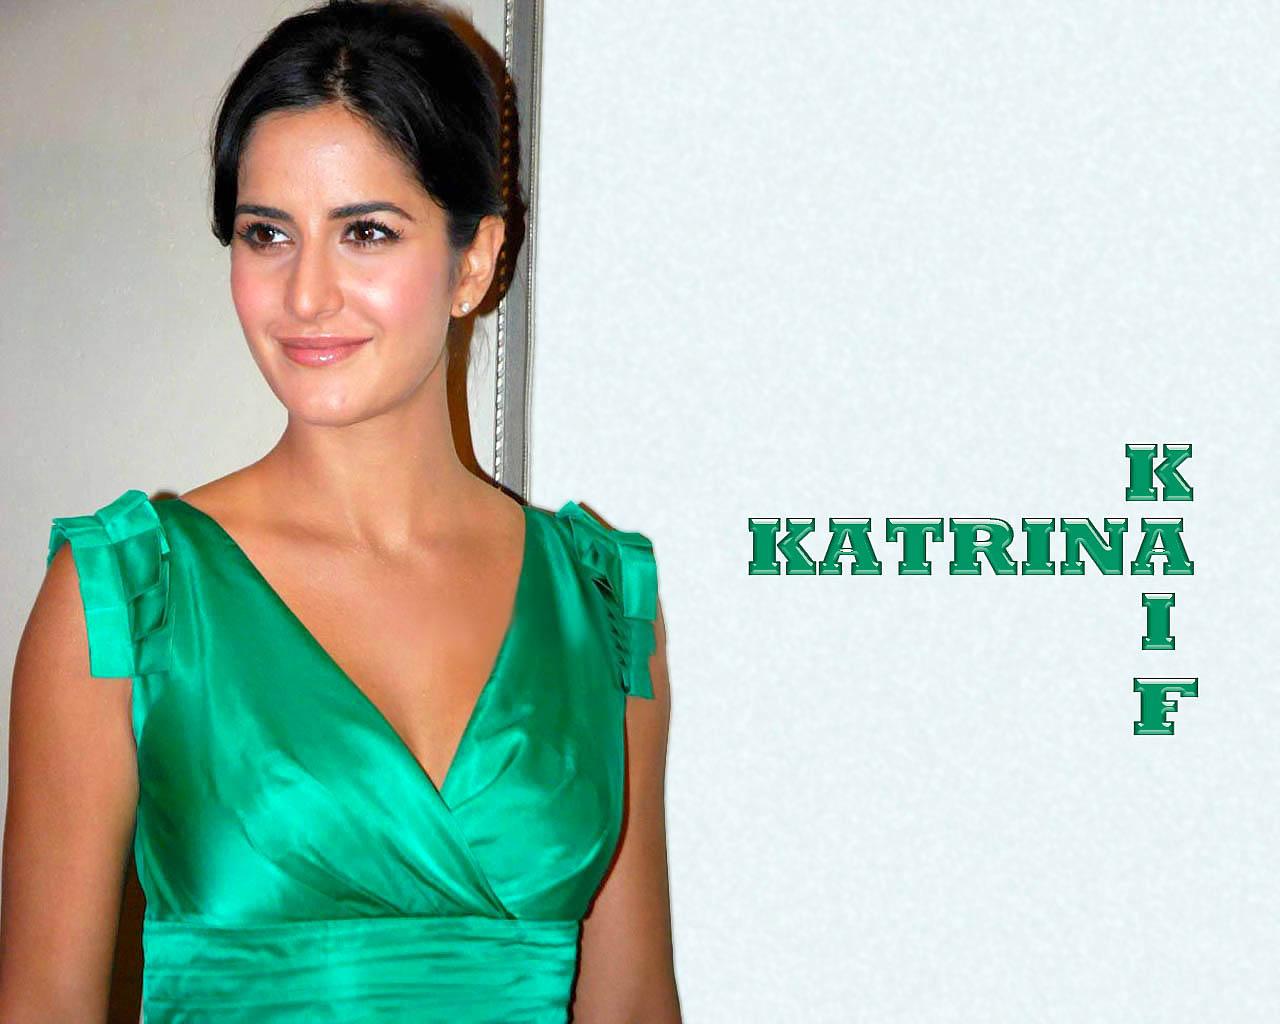 Katrina in green dress | Katrina Kaif | Pinterest | Dresses, Green ...